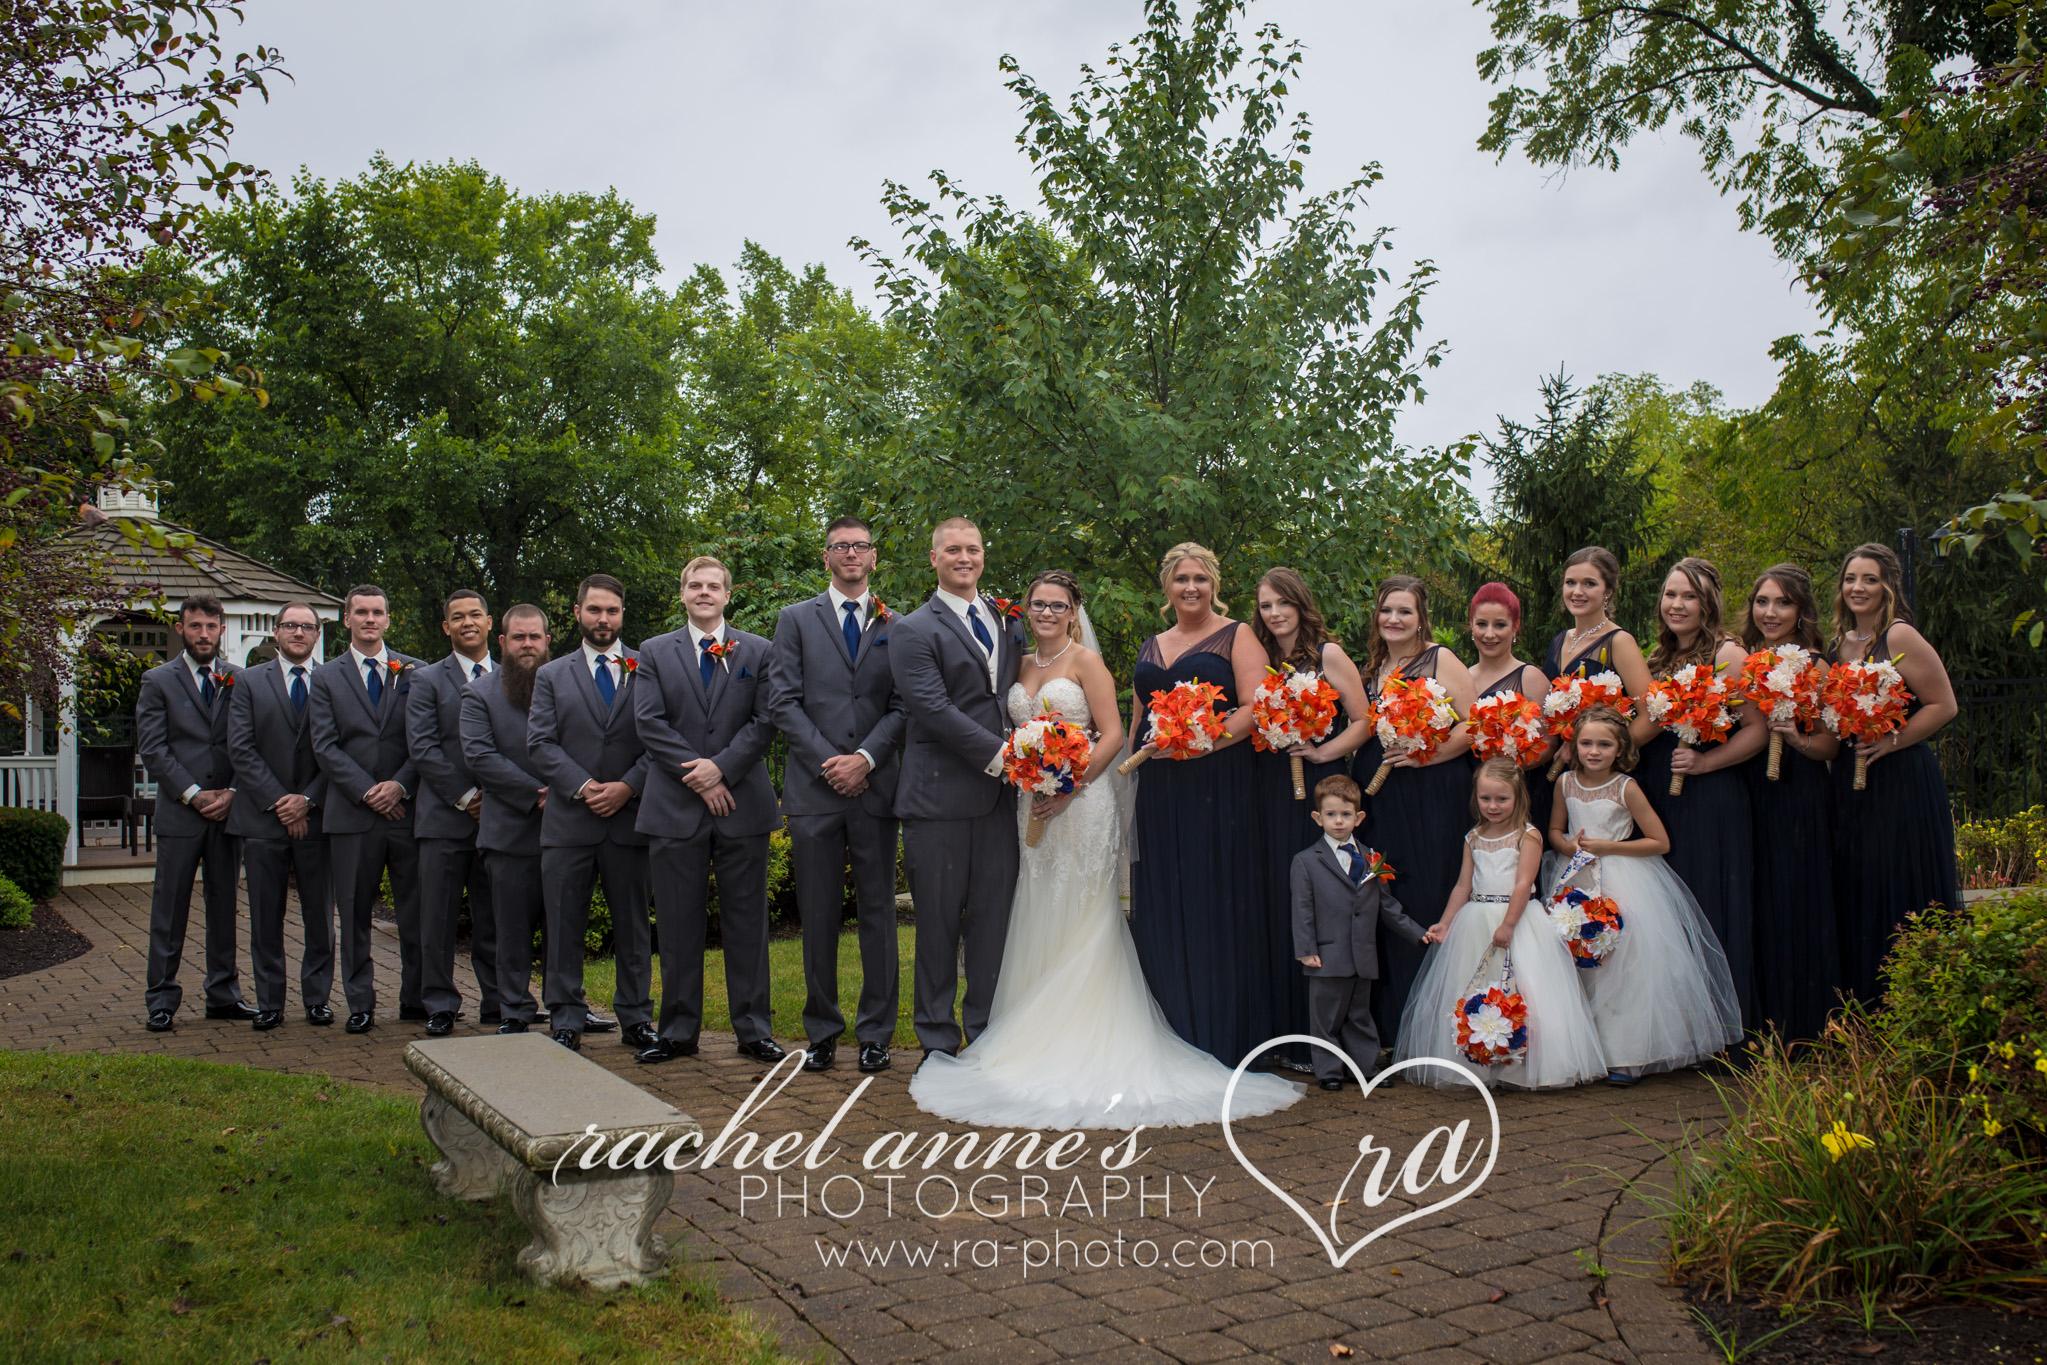 031-JCM-OLD-ECONOMY-VILLAGE-THE-FEZ-PA-WEDDINGS.jpg